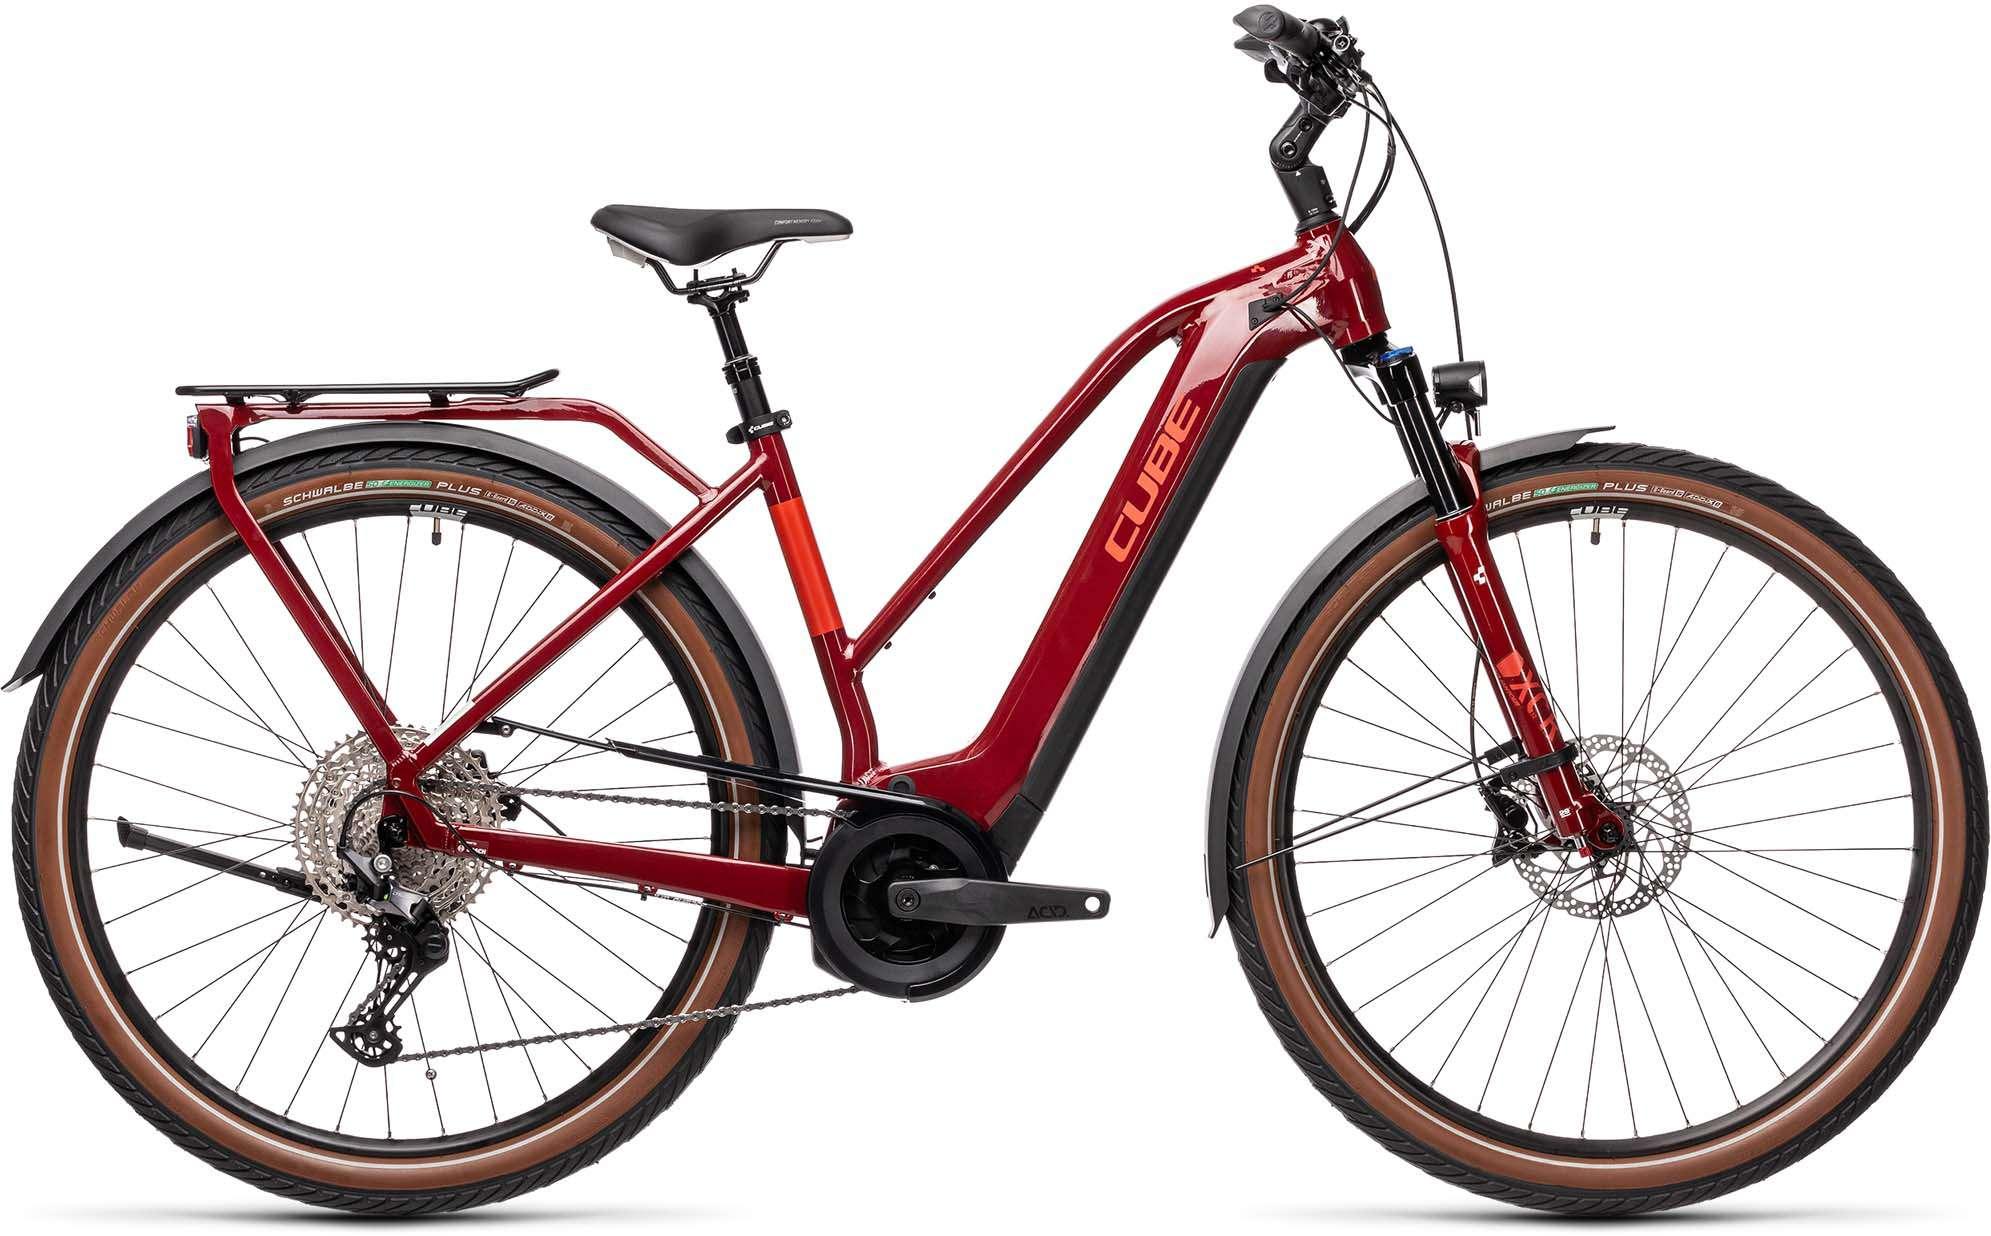 www.mhw-bike.com